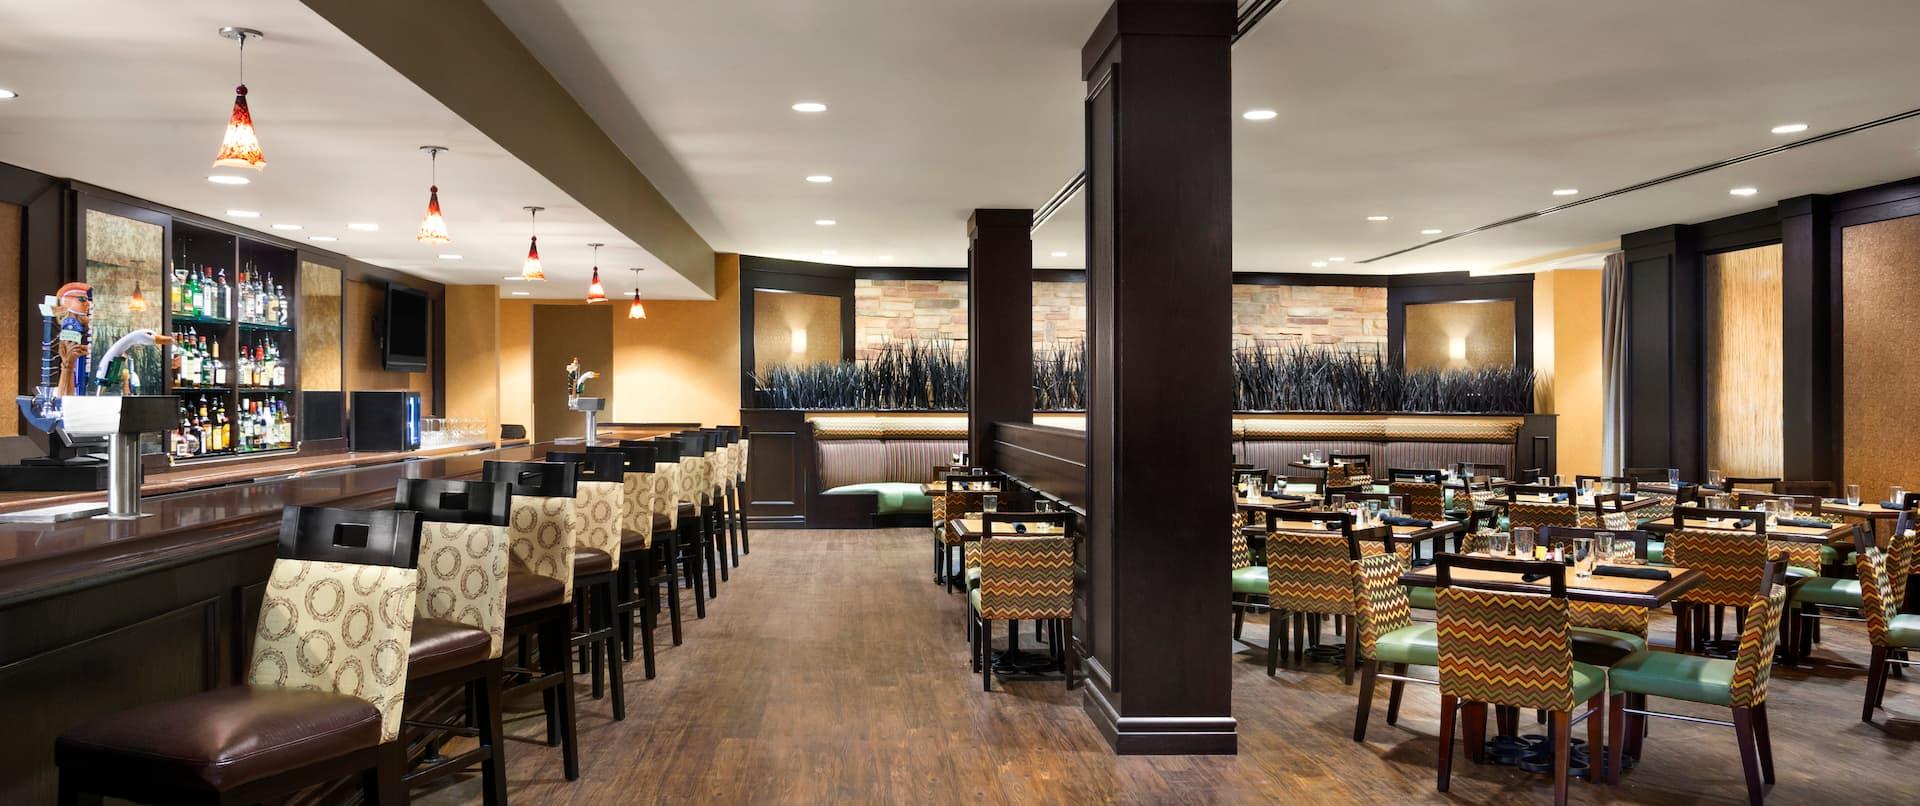 Flatland Grille & Bar